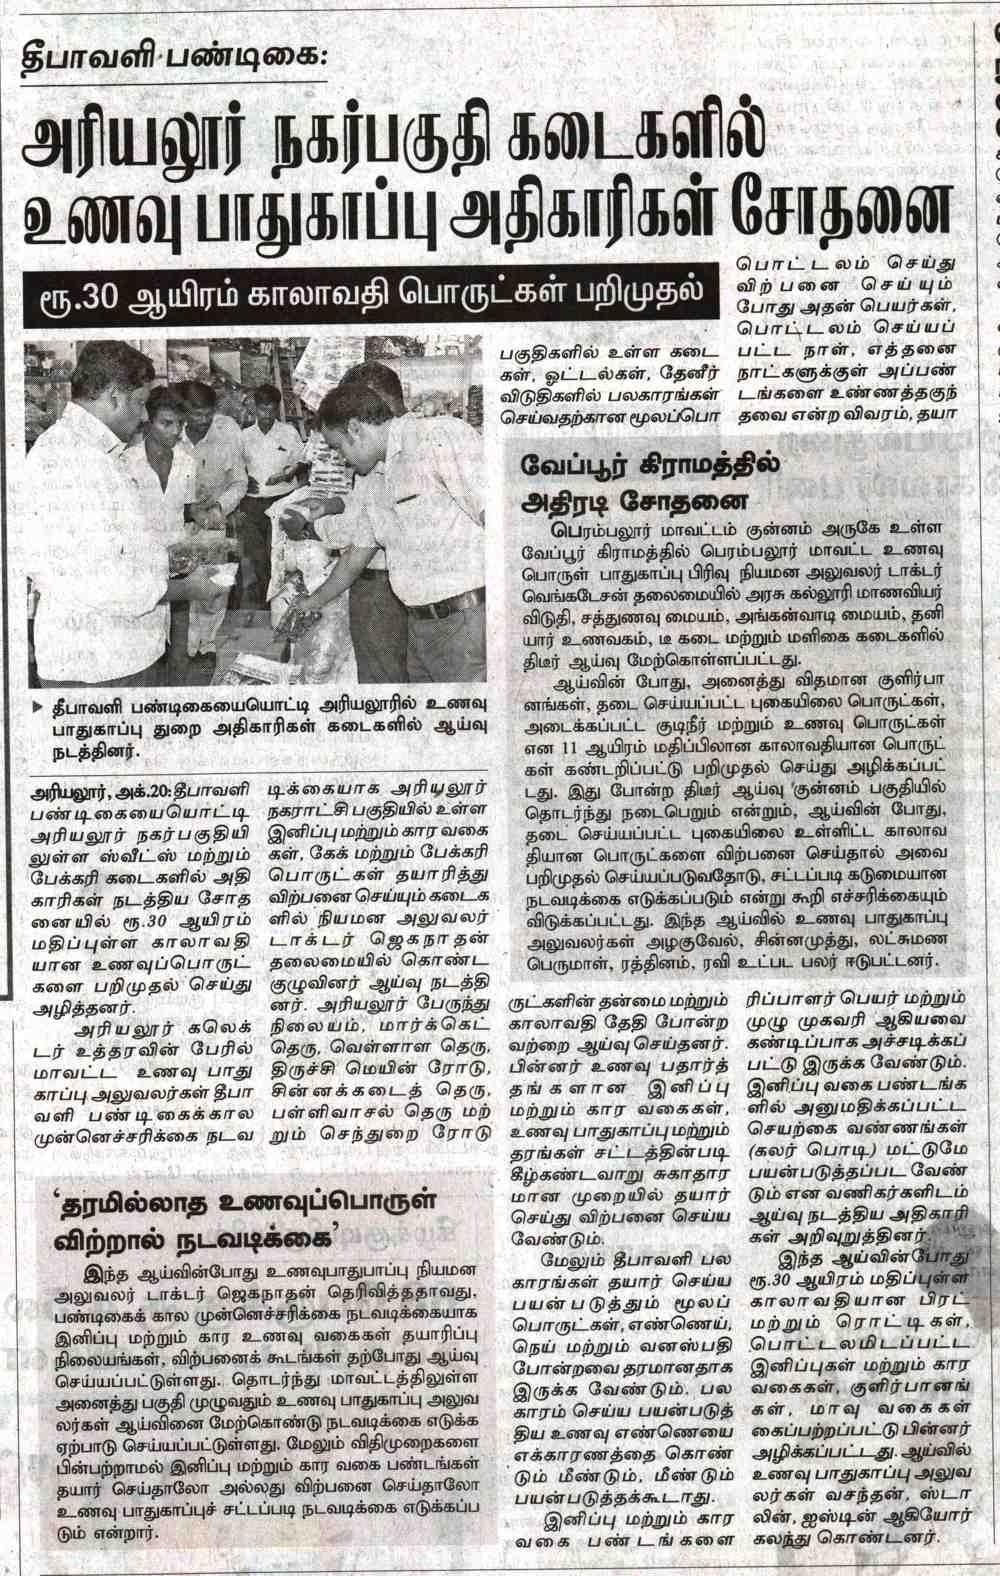 Paper News 20.10.16 001-n